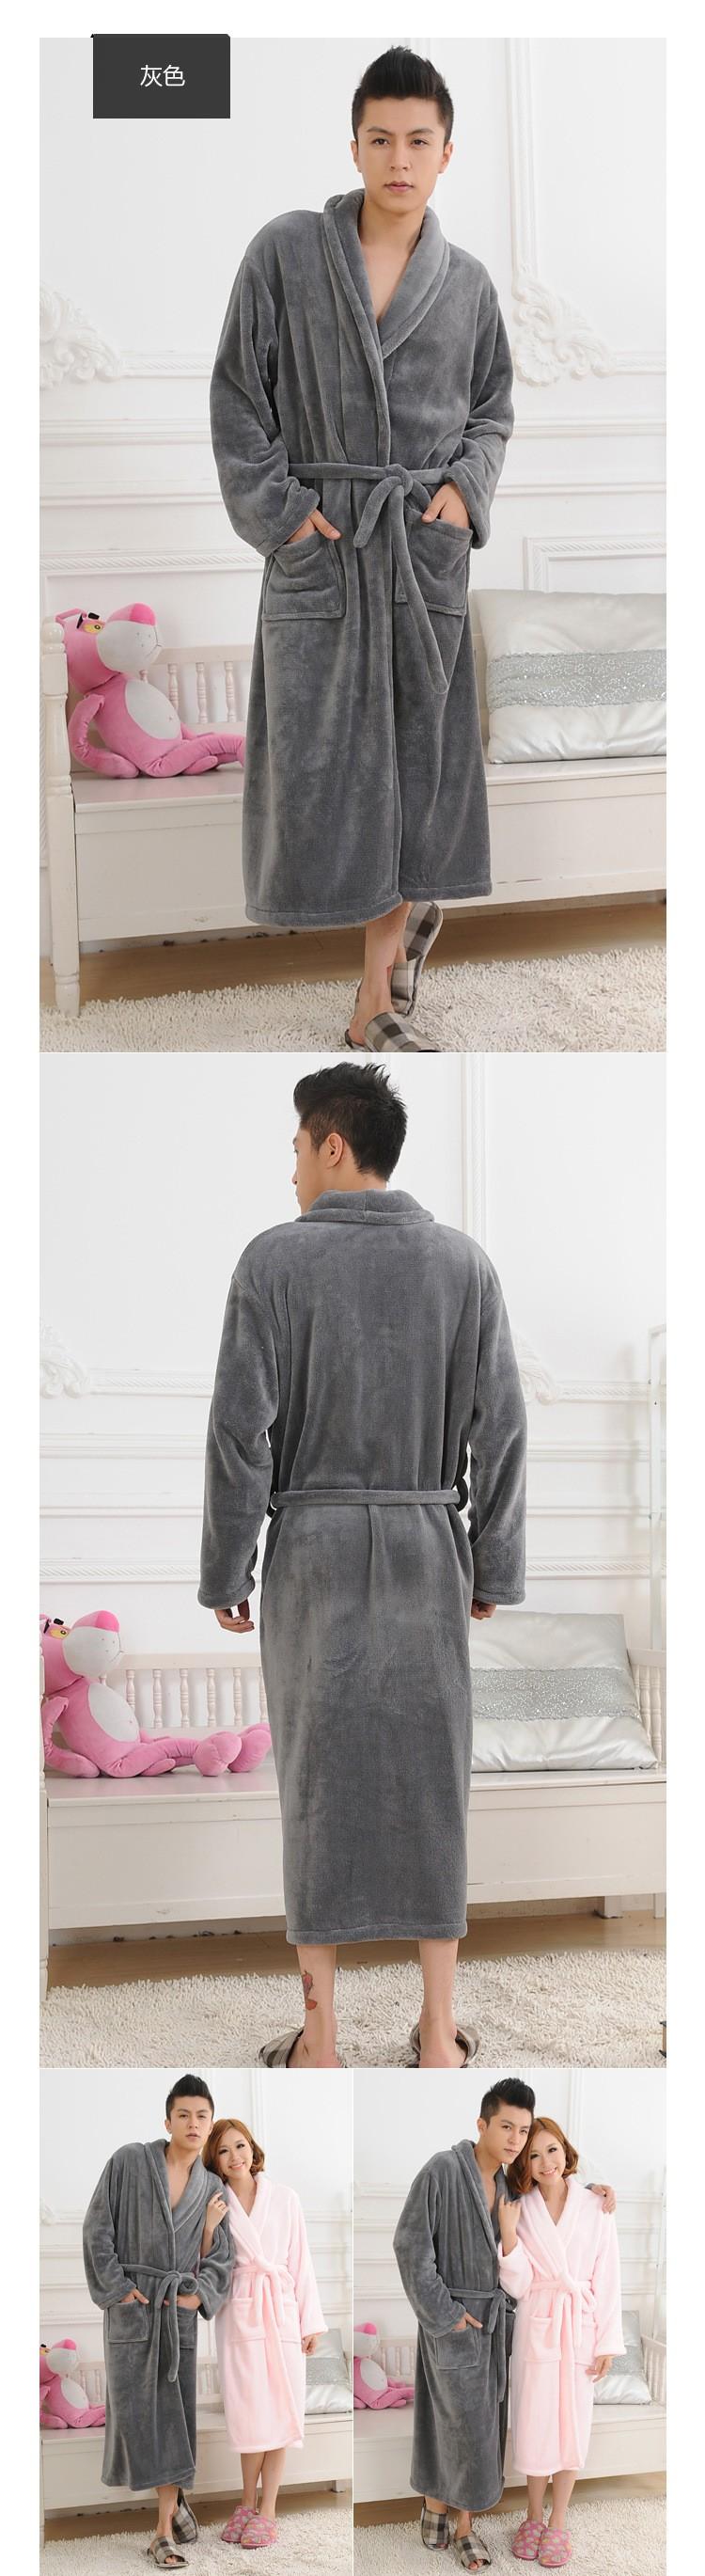 bathrobe (11)